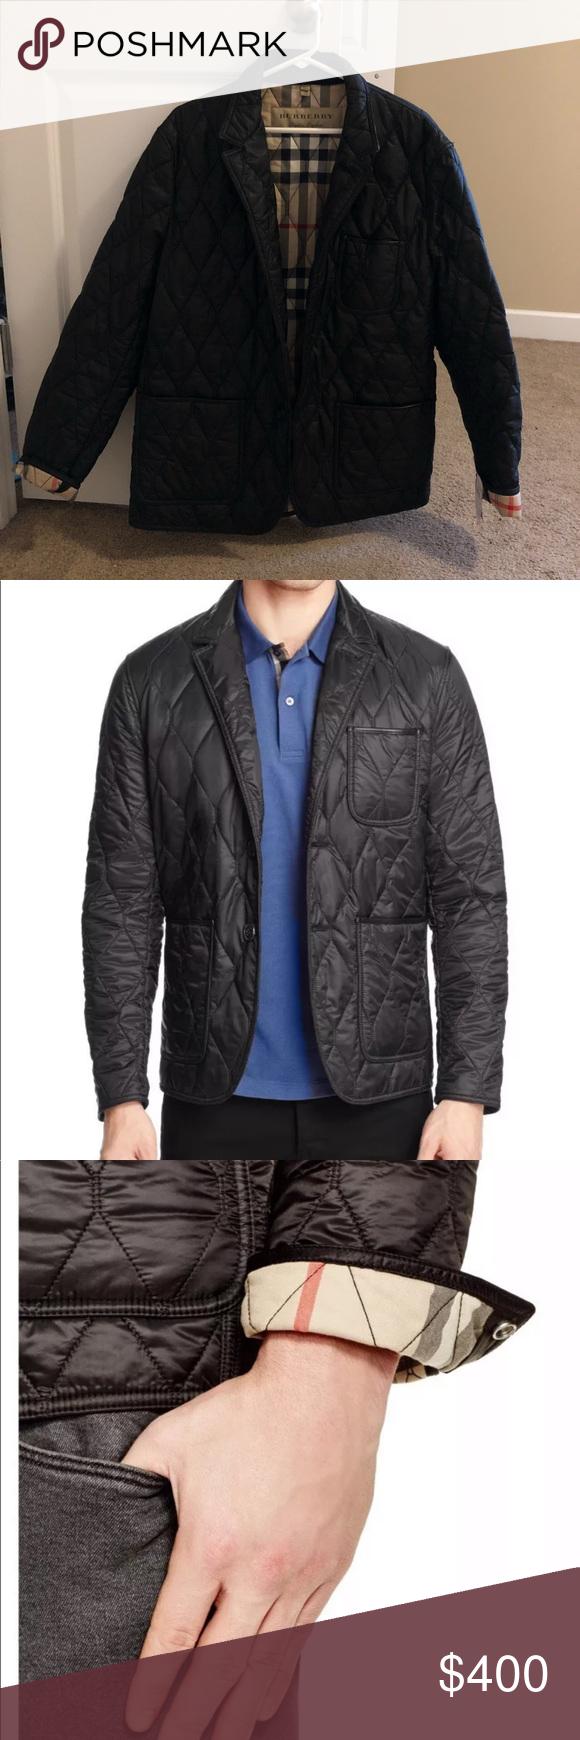 New Burberry Gillington Quilted Jacket Xxl Men S Brand New Burberry Gillington Quilted Jacket 100 Authentic Size Xxl Retails For My Posh Closet Quilt